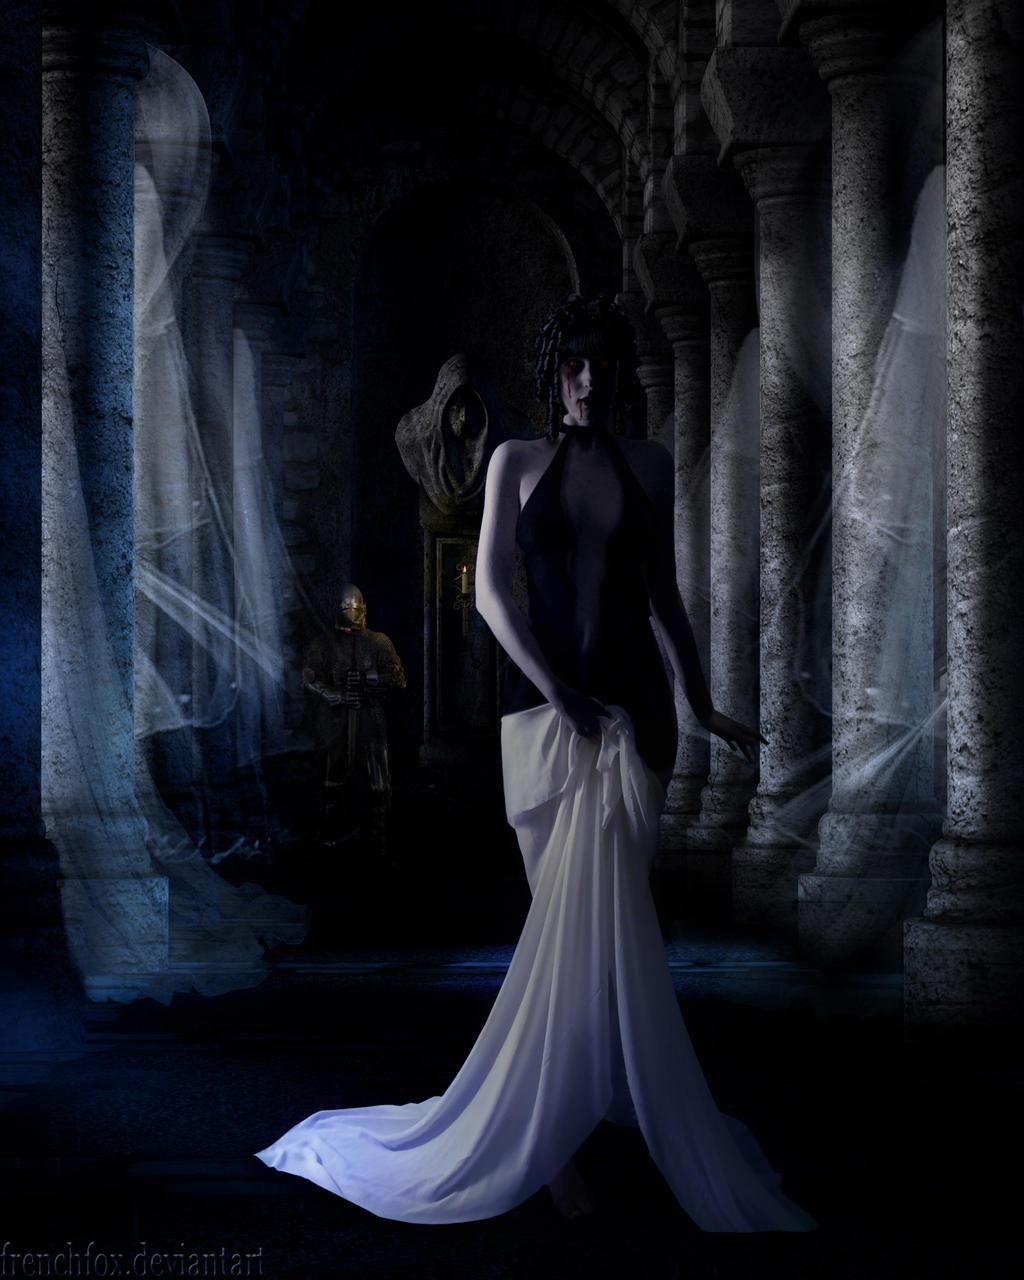 La Comtesse Vampire by frenchfox on DeviantArt